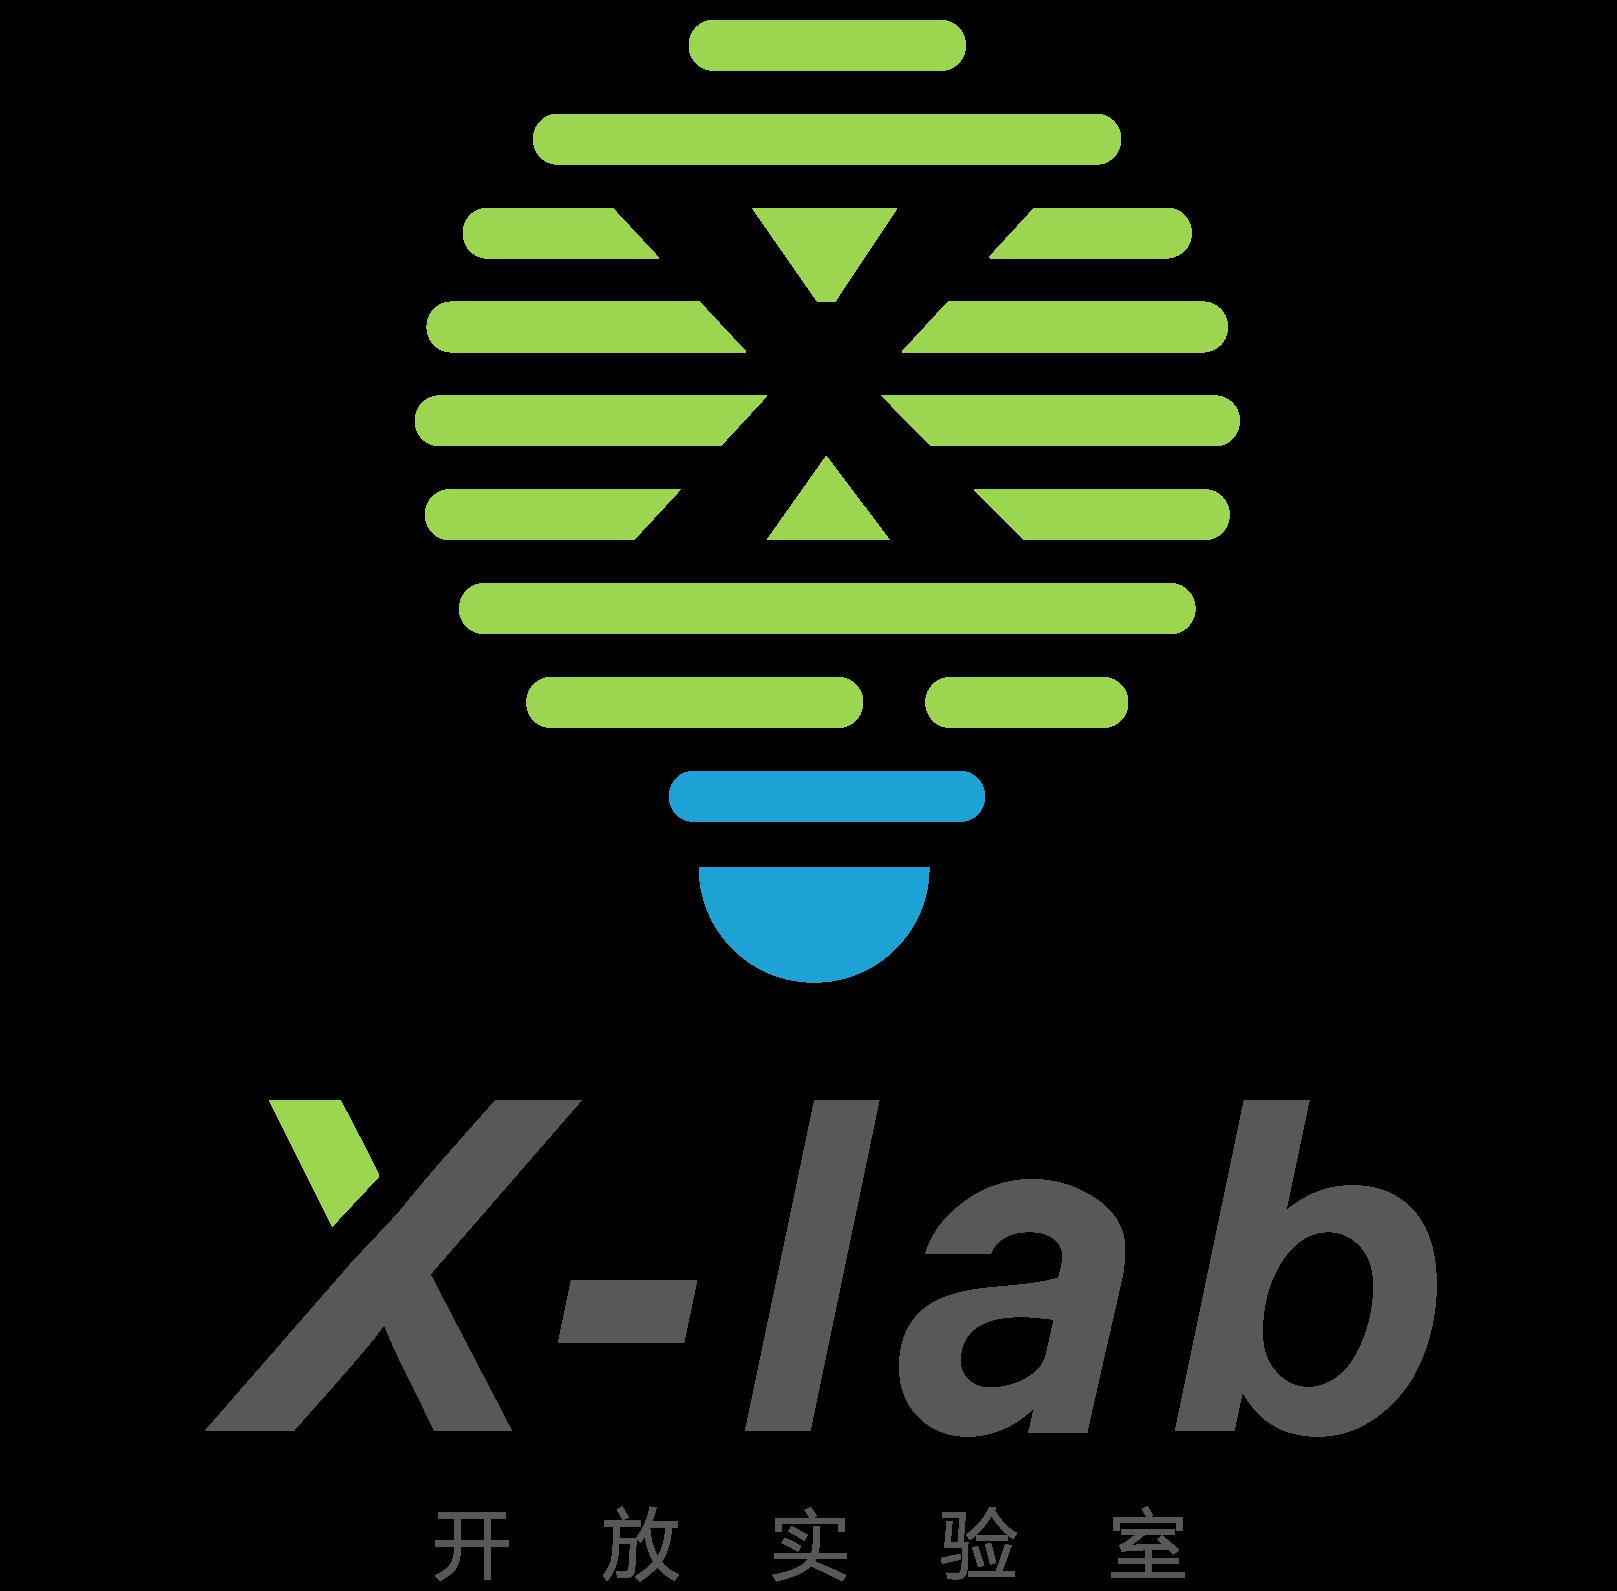 X-lab